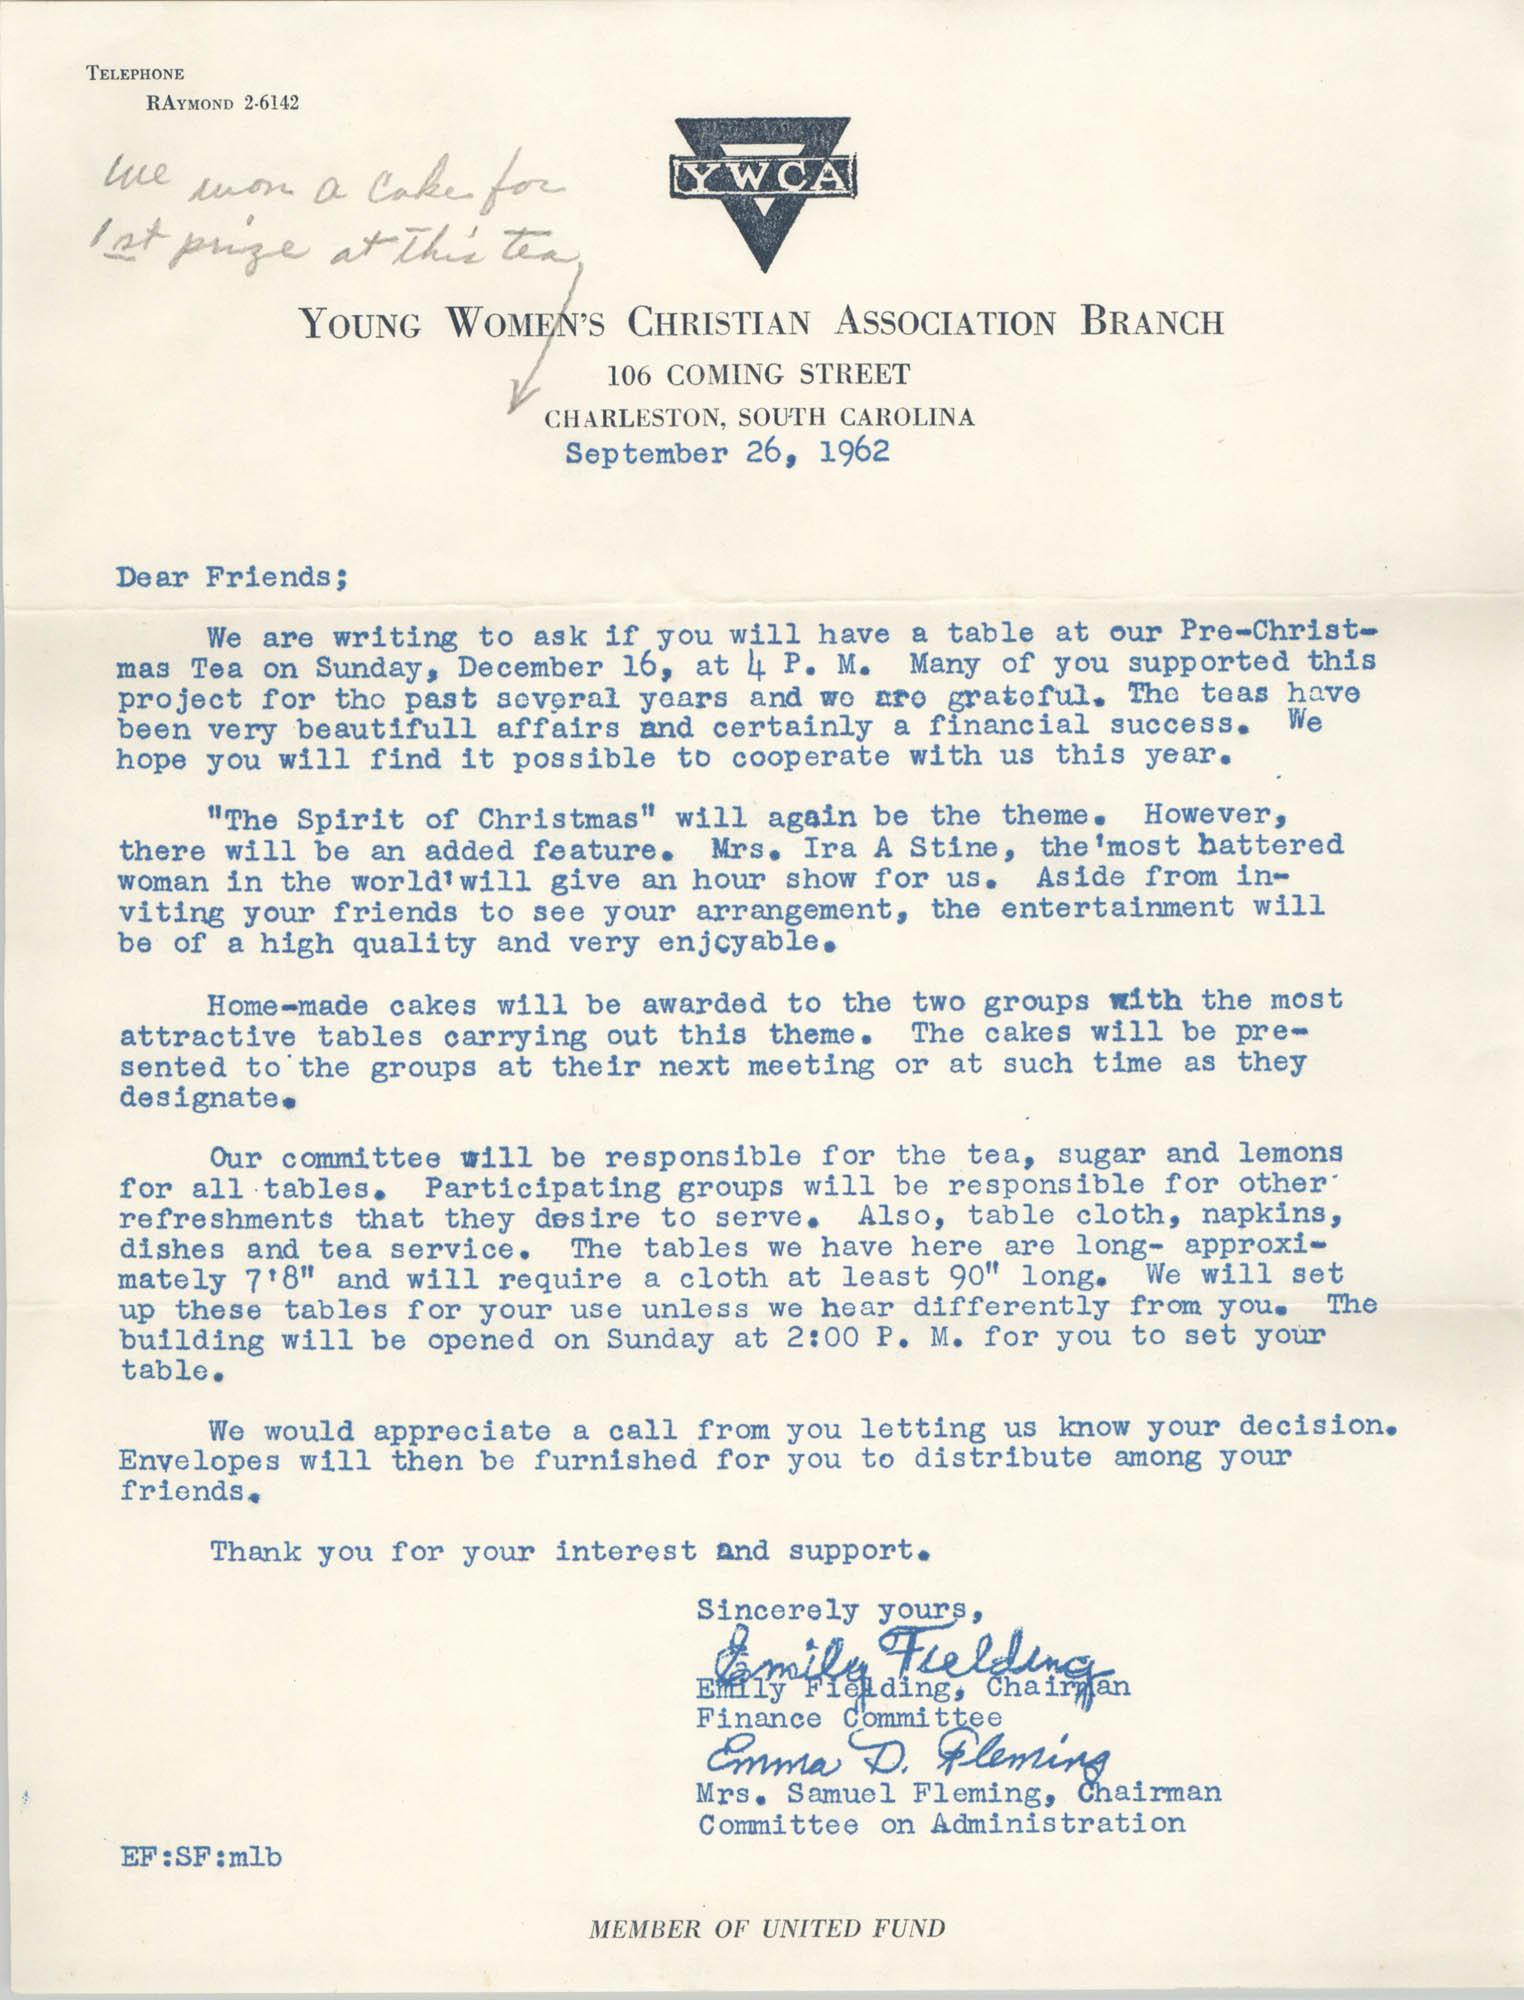 Letter from Emily Fielding and Emma Fleming, September 26, 1962